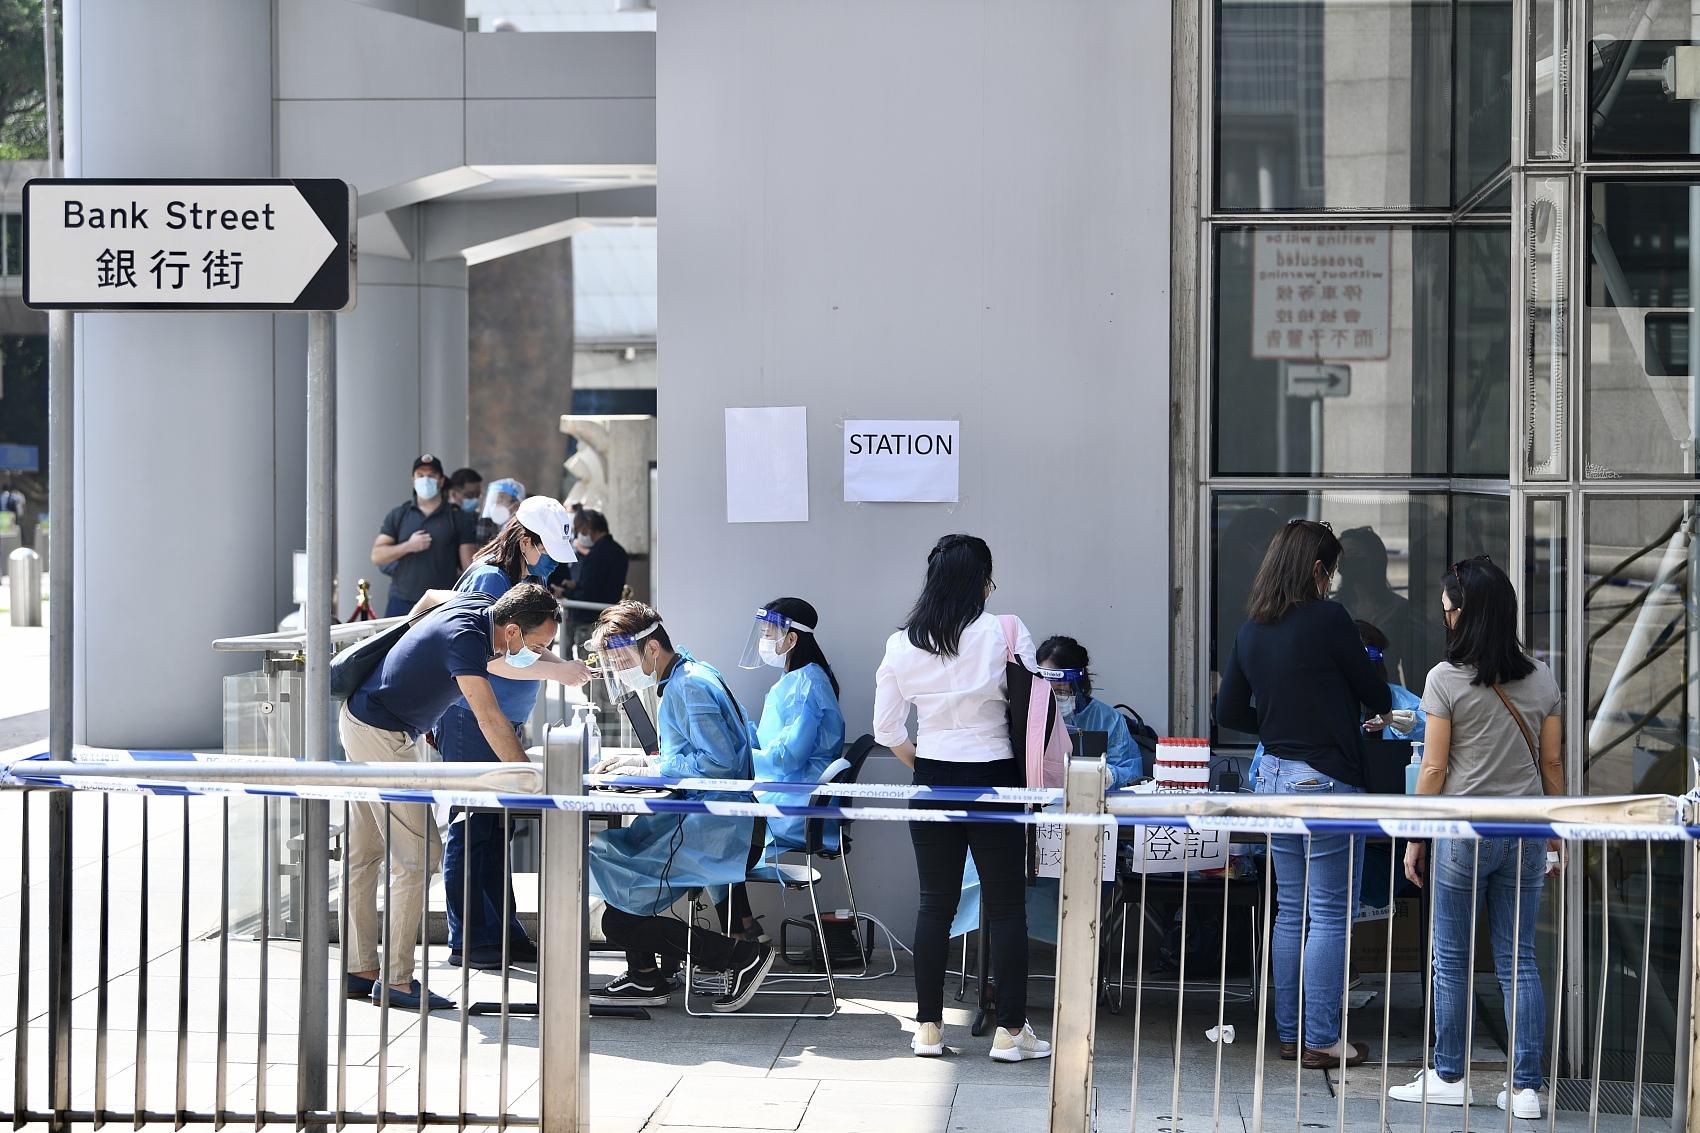 Hong Kong reports 10 new COVID-19 cases